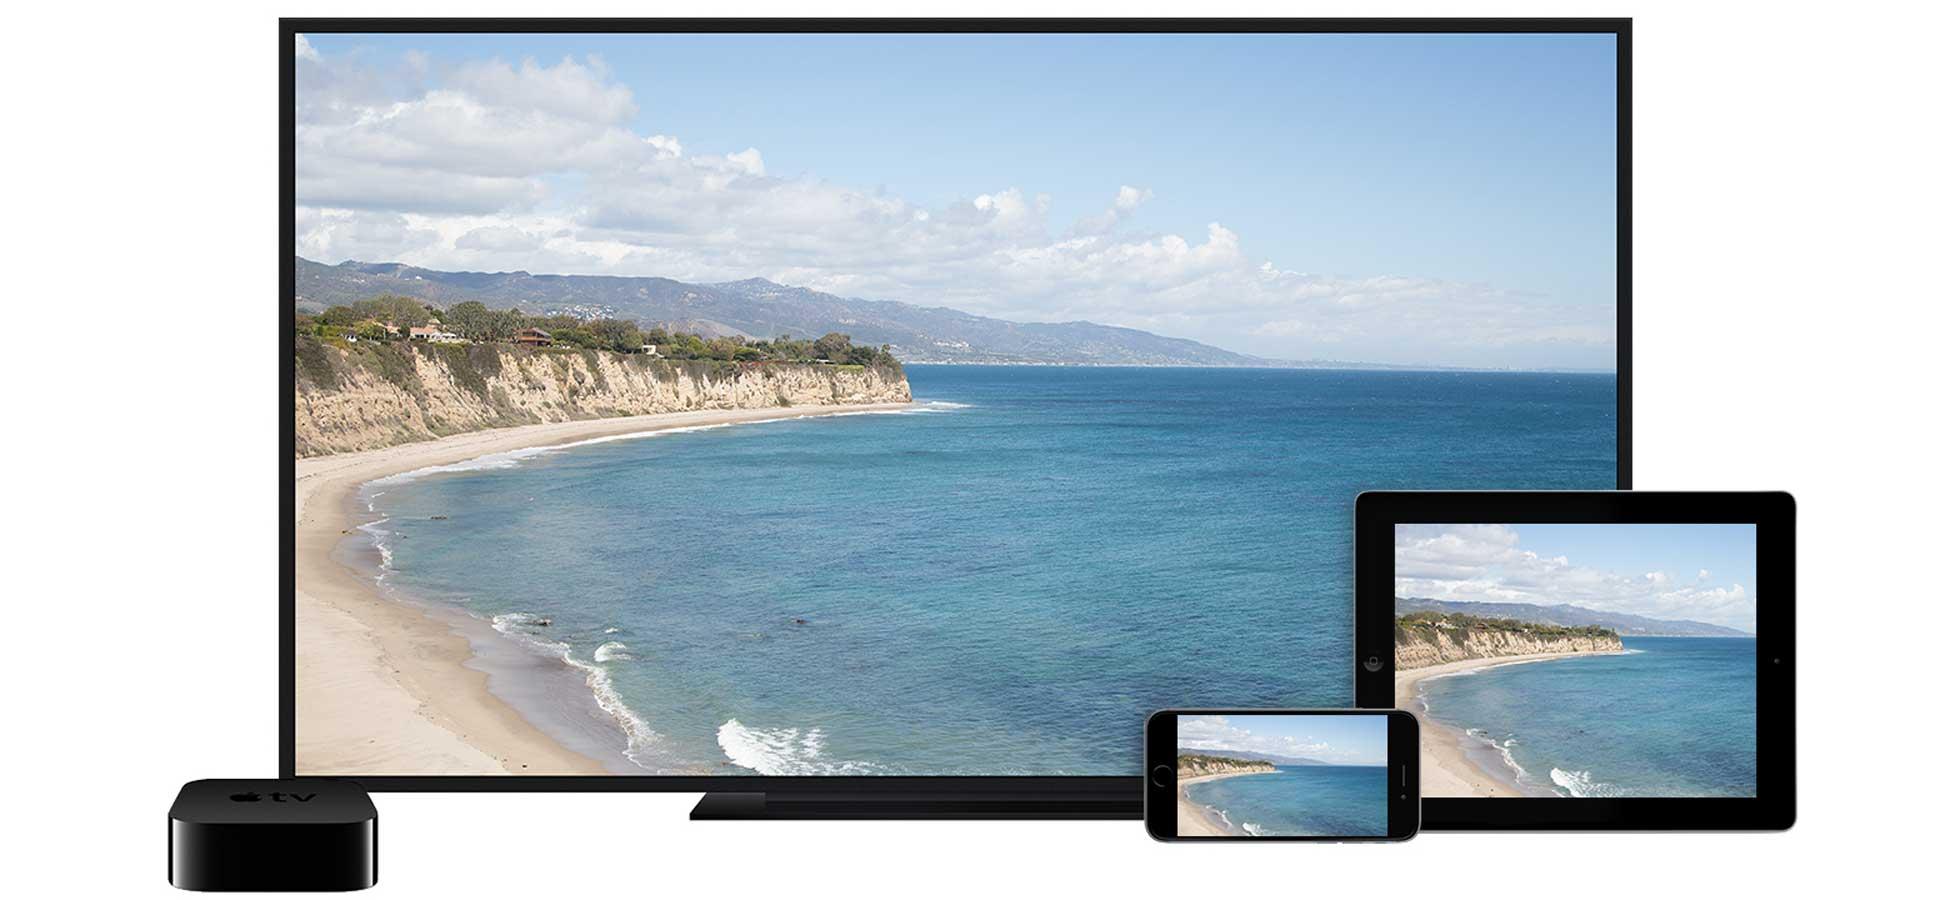 AirPlay yansıtma çalışmıyor AirPlay AirPlay Yansıtma Çalışmıyor Sorununa Çözüm Yolları airplay yansitma calismiyor